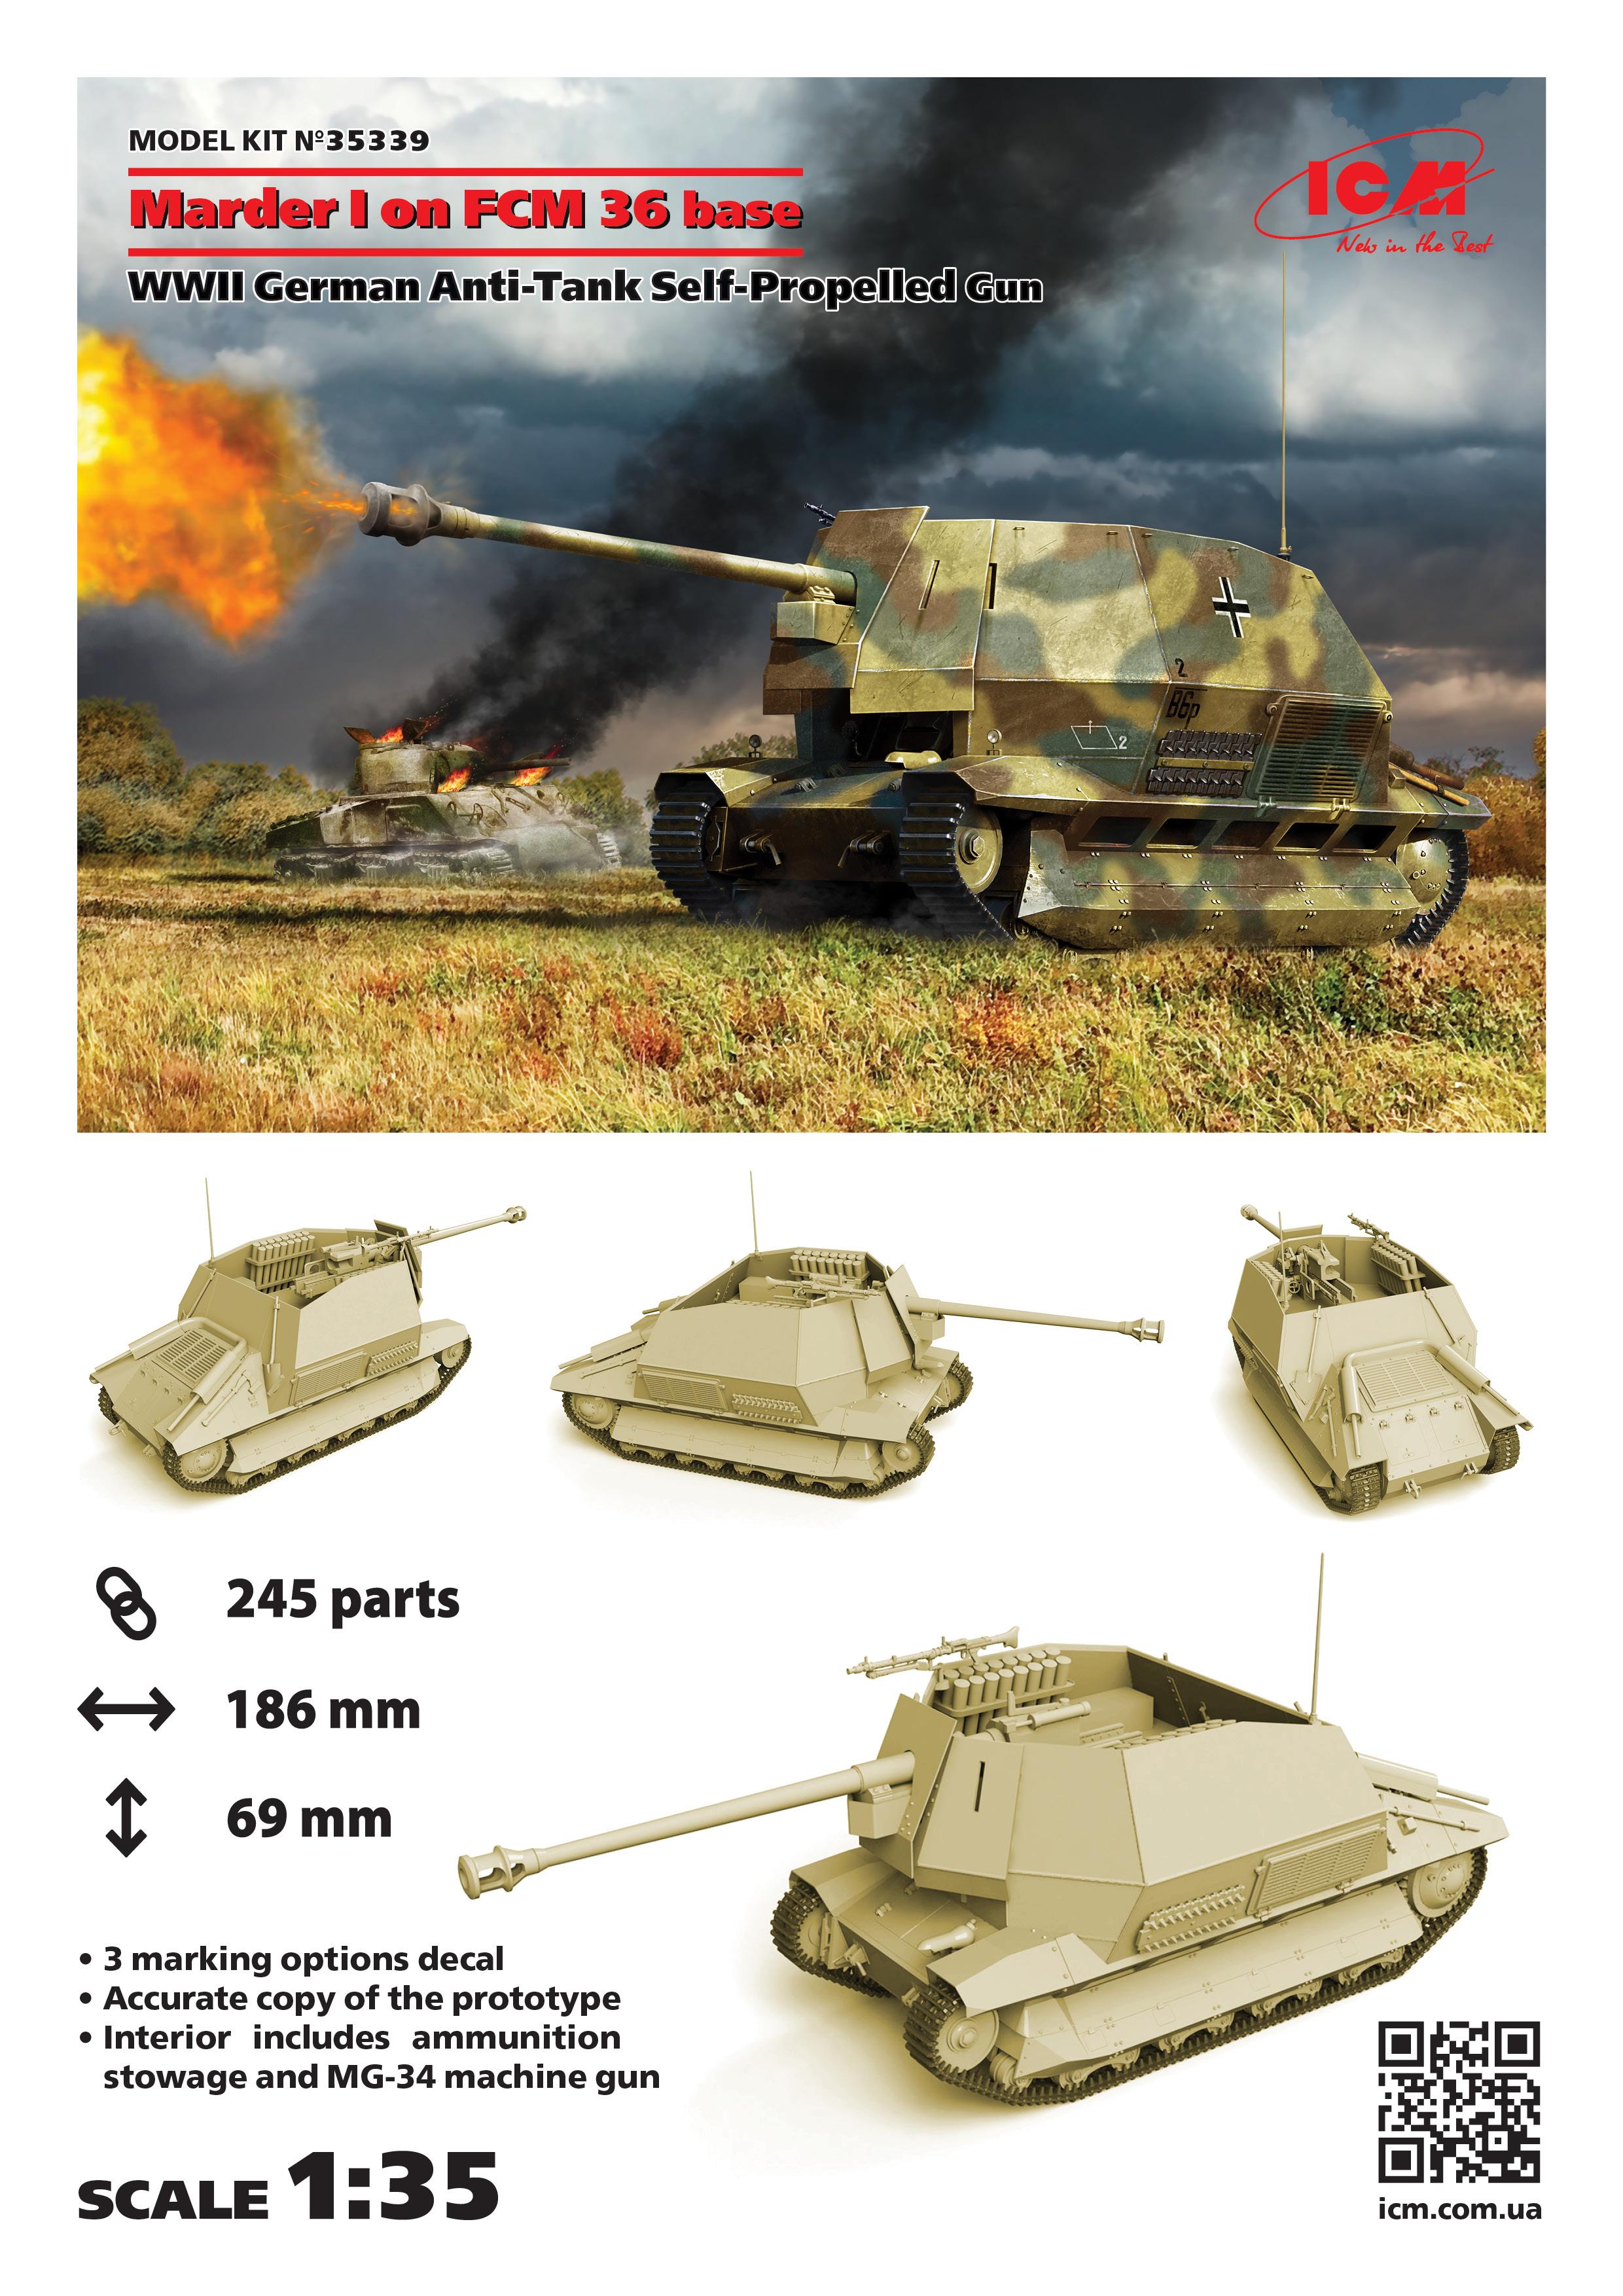 1/35 Marder I on FCM 36 base, WWII German Anti-Tank